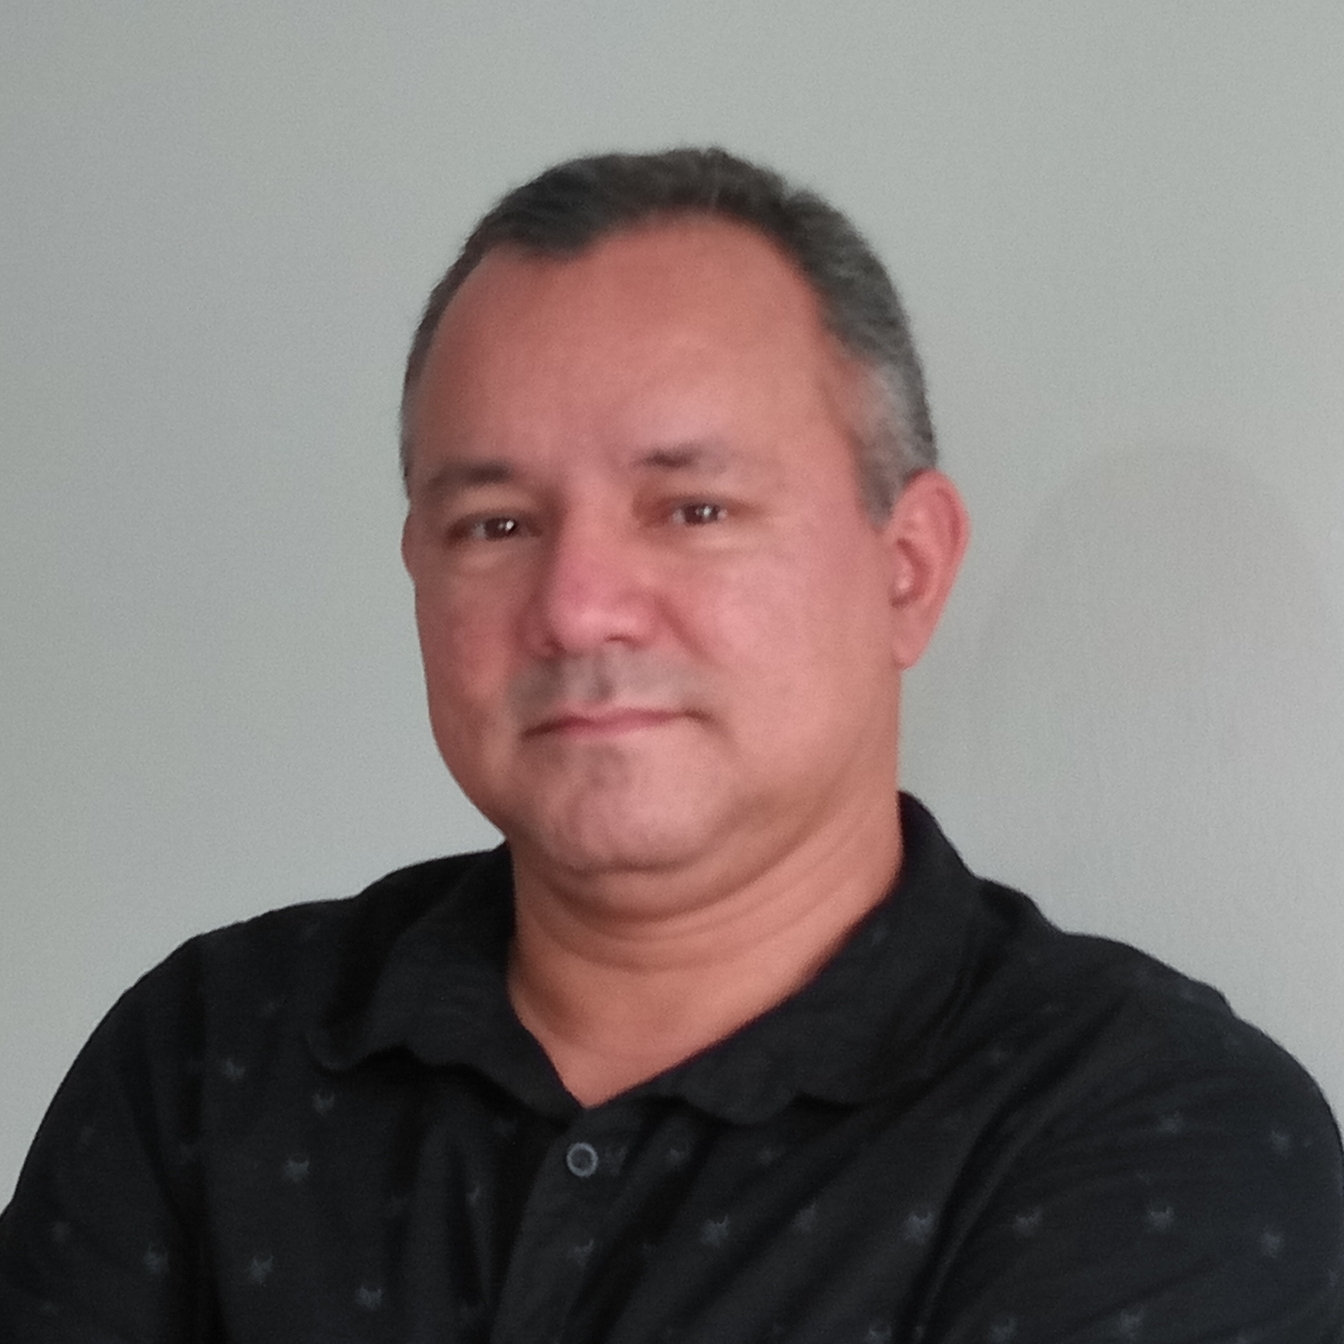 JOSÉ ROBERTO DA COSTA FERREIRA